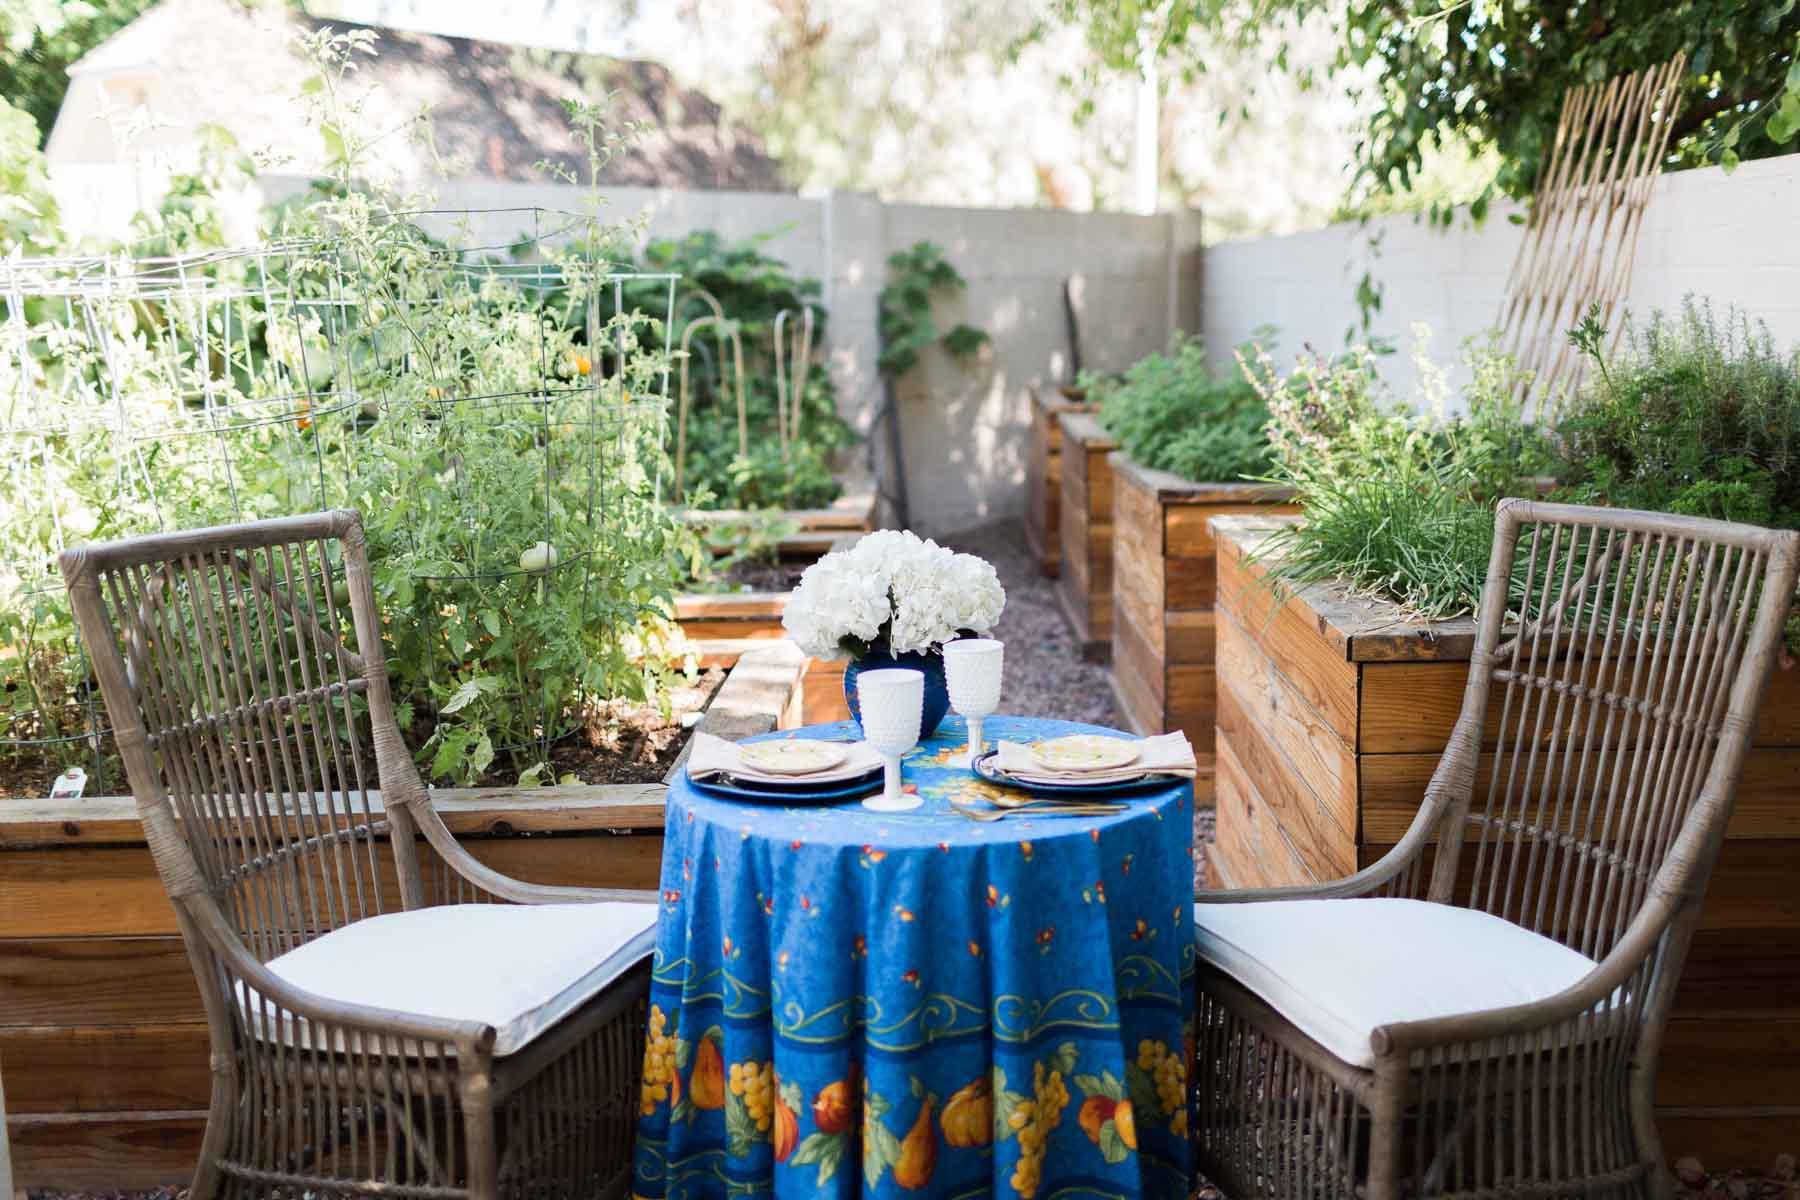 OutdoorHaven-Phoenix-AZ-Arizona-outdoor-photoshoot-location-natural-light-photography-studio-lifestyle-photo-ideas-indoor-photoshoot-location-12.jpg